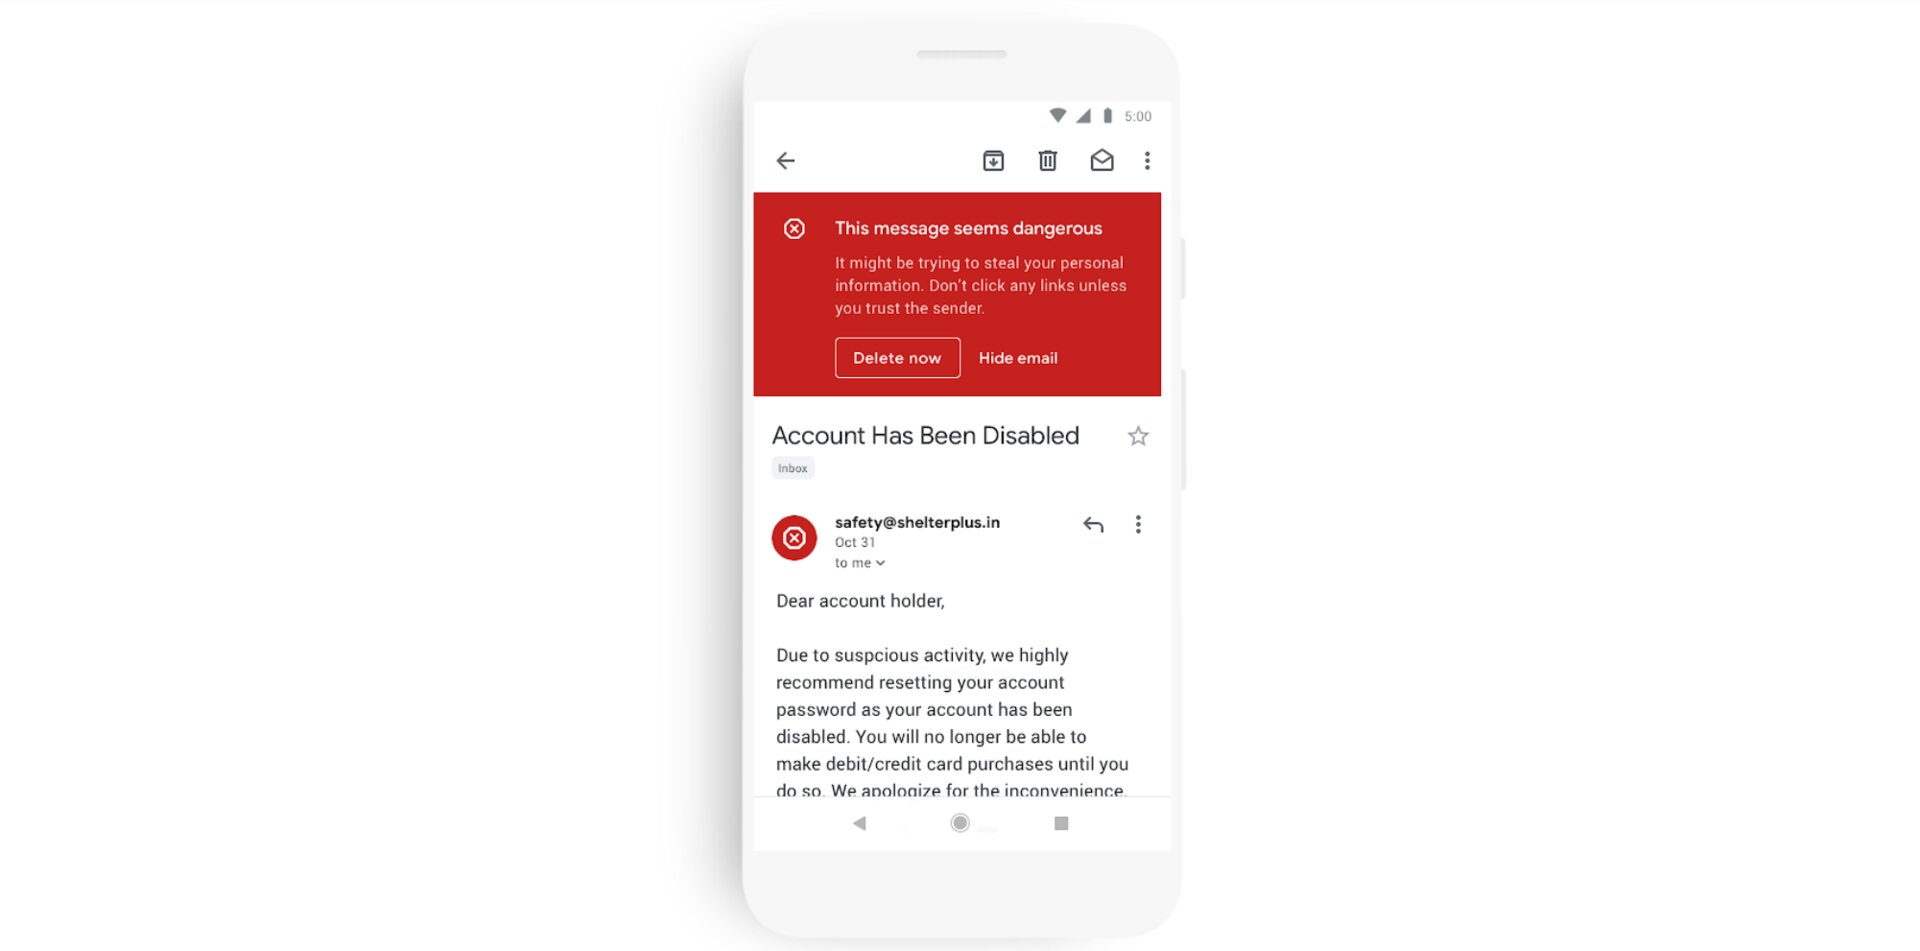 Gmail Warnung